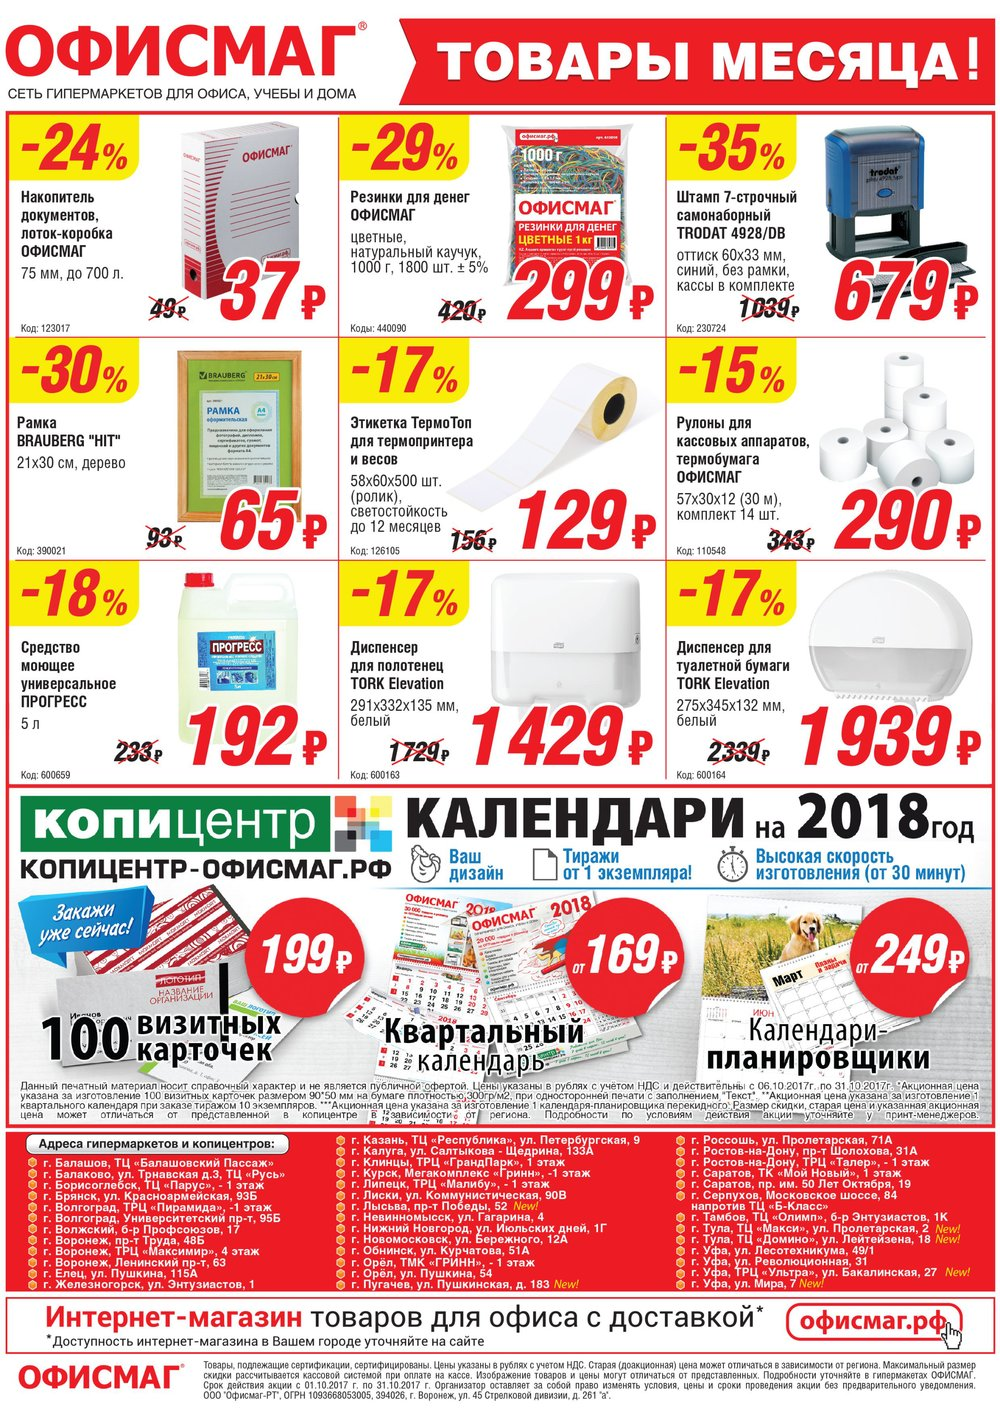 Каталог акций Офисмаг с 1 по 31 октября 2017 - стр. 2